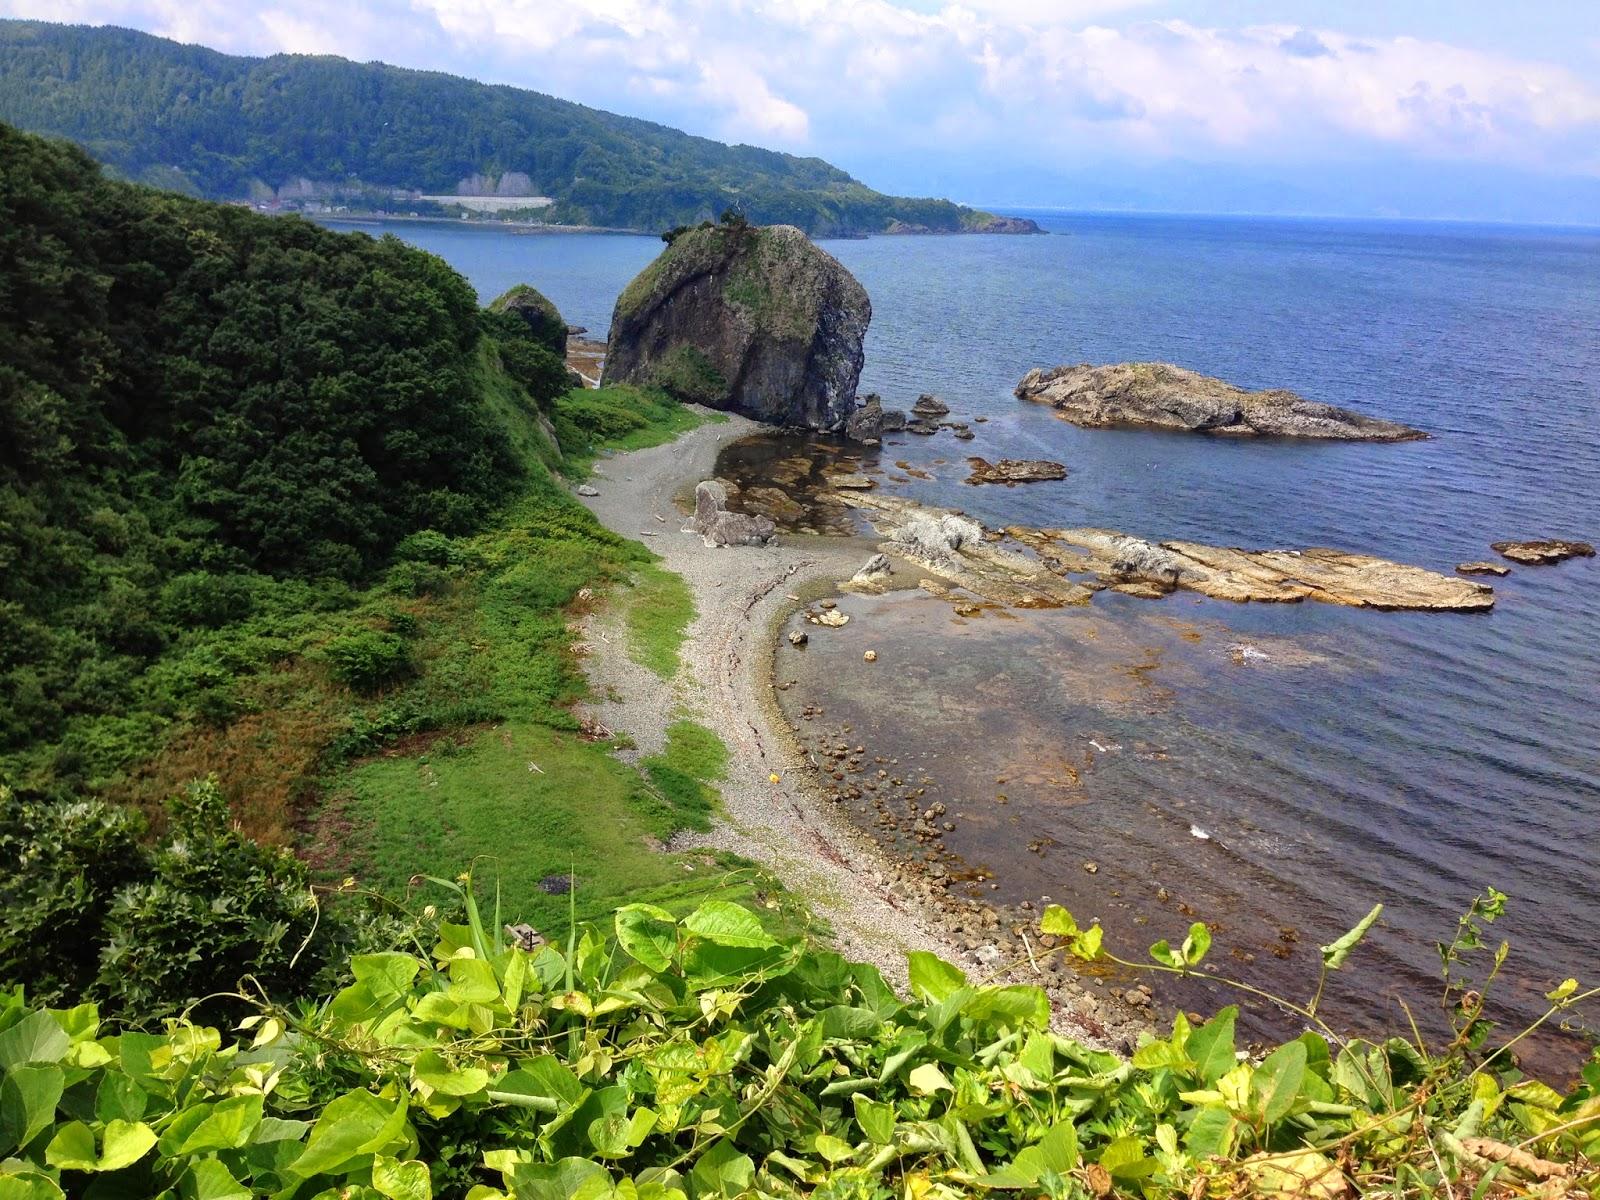 aomori coast, cycling aomori